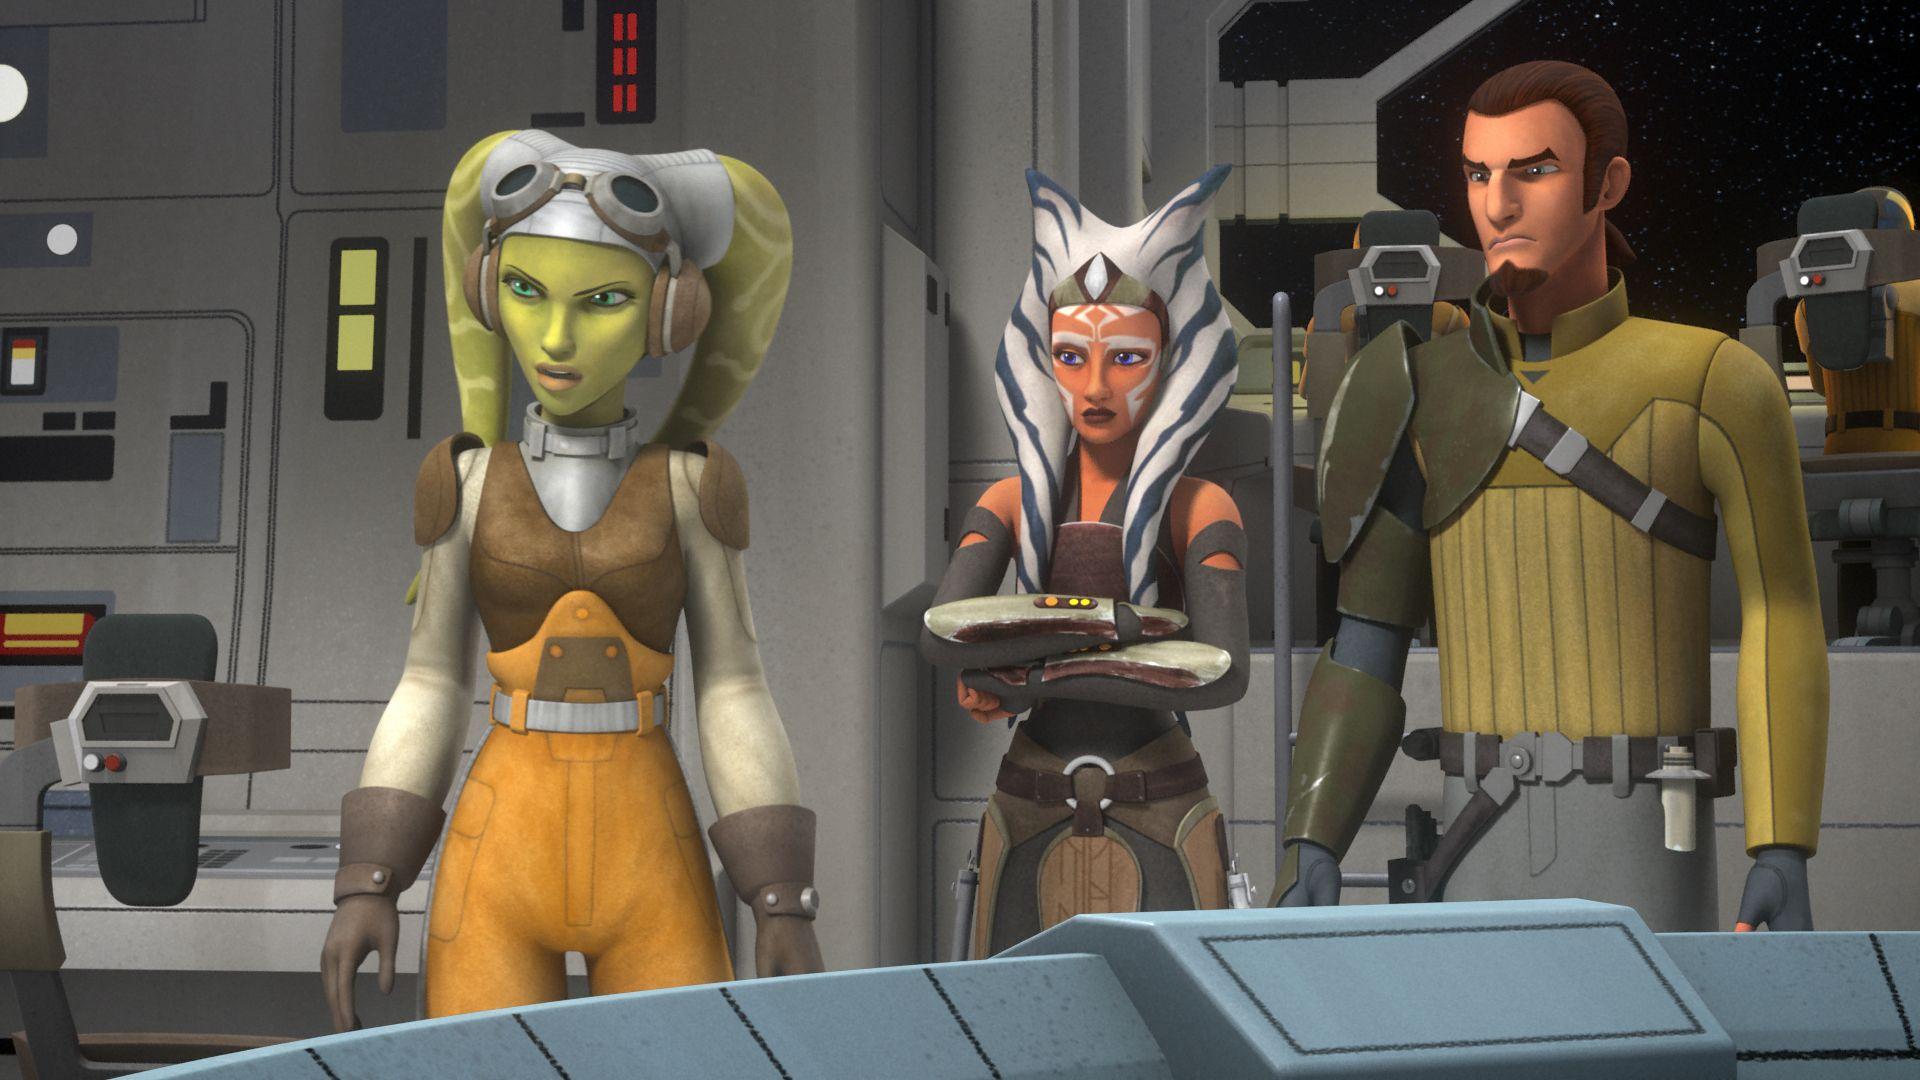 star wars rebels download